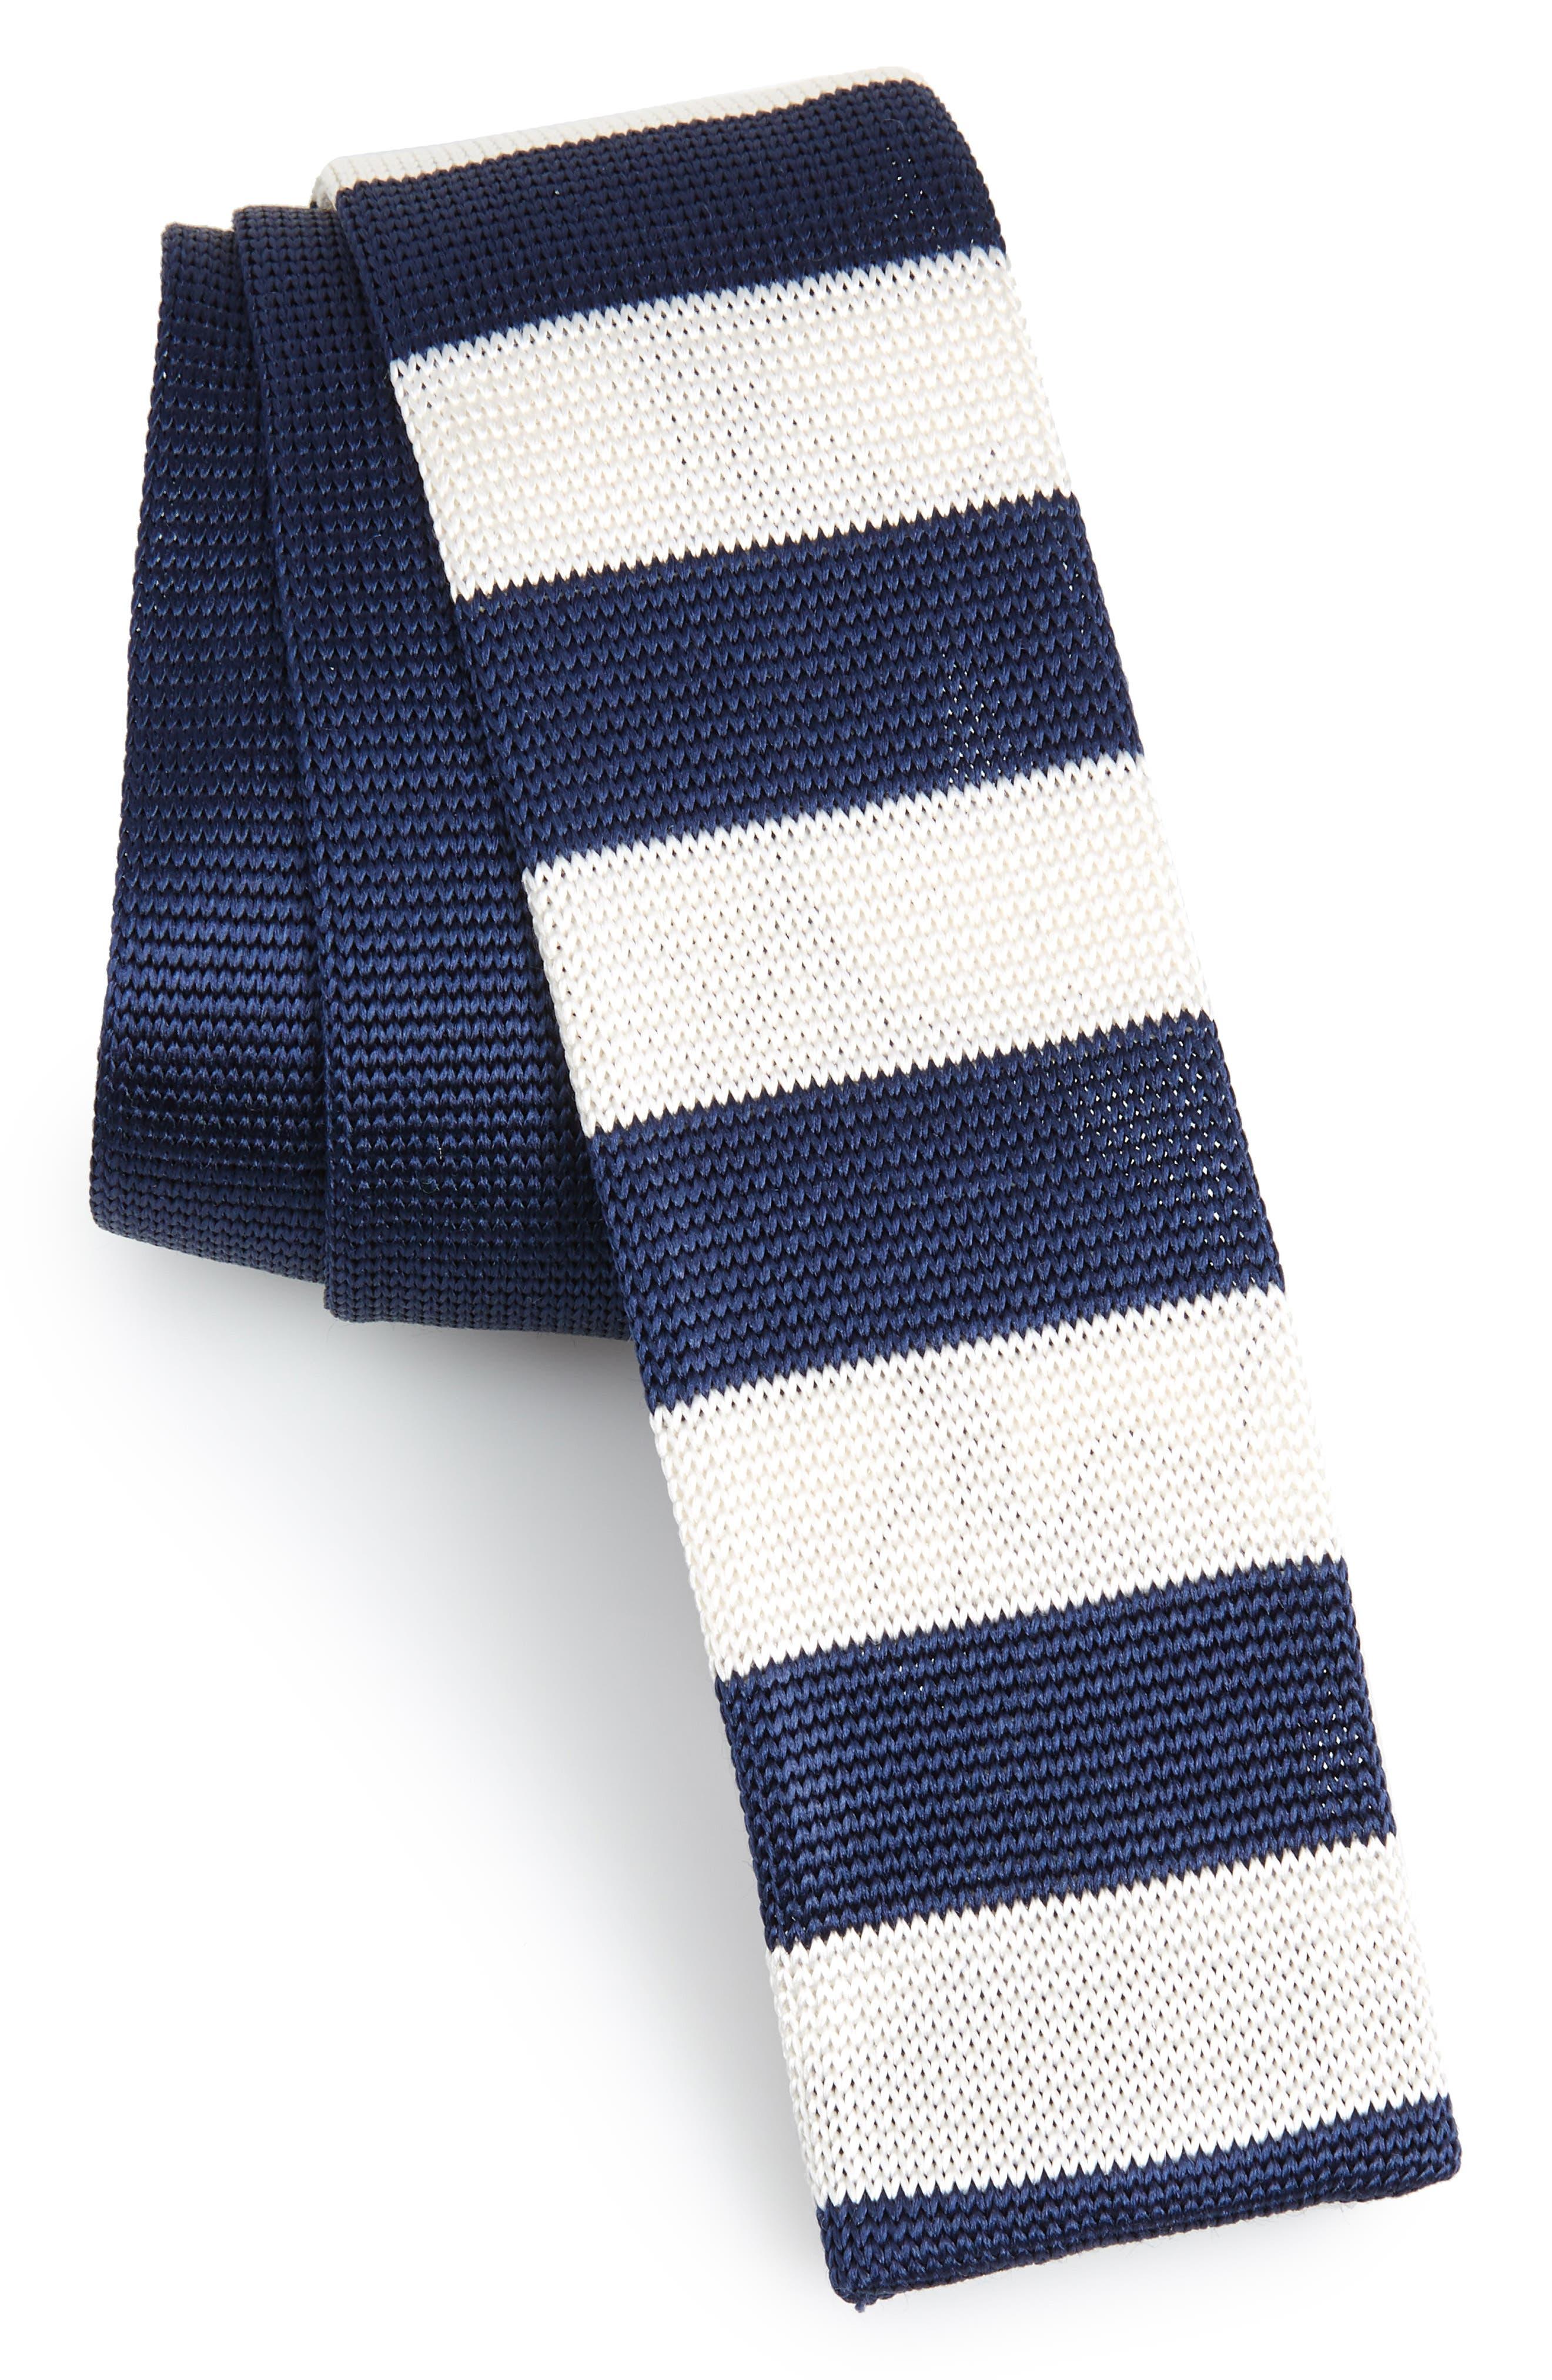 Stripe Knit Silk Skinny Tie,                         Main,                         color, Navy